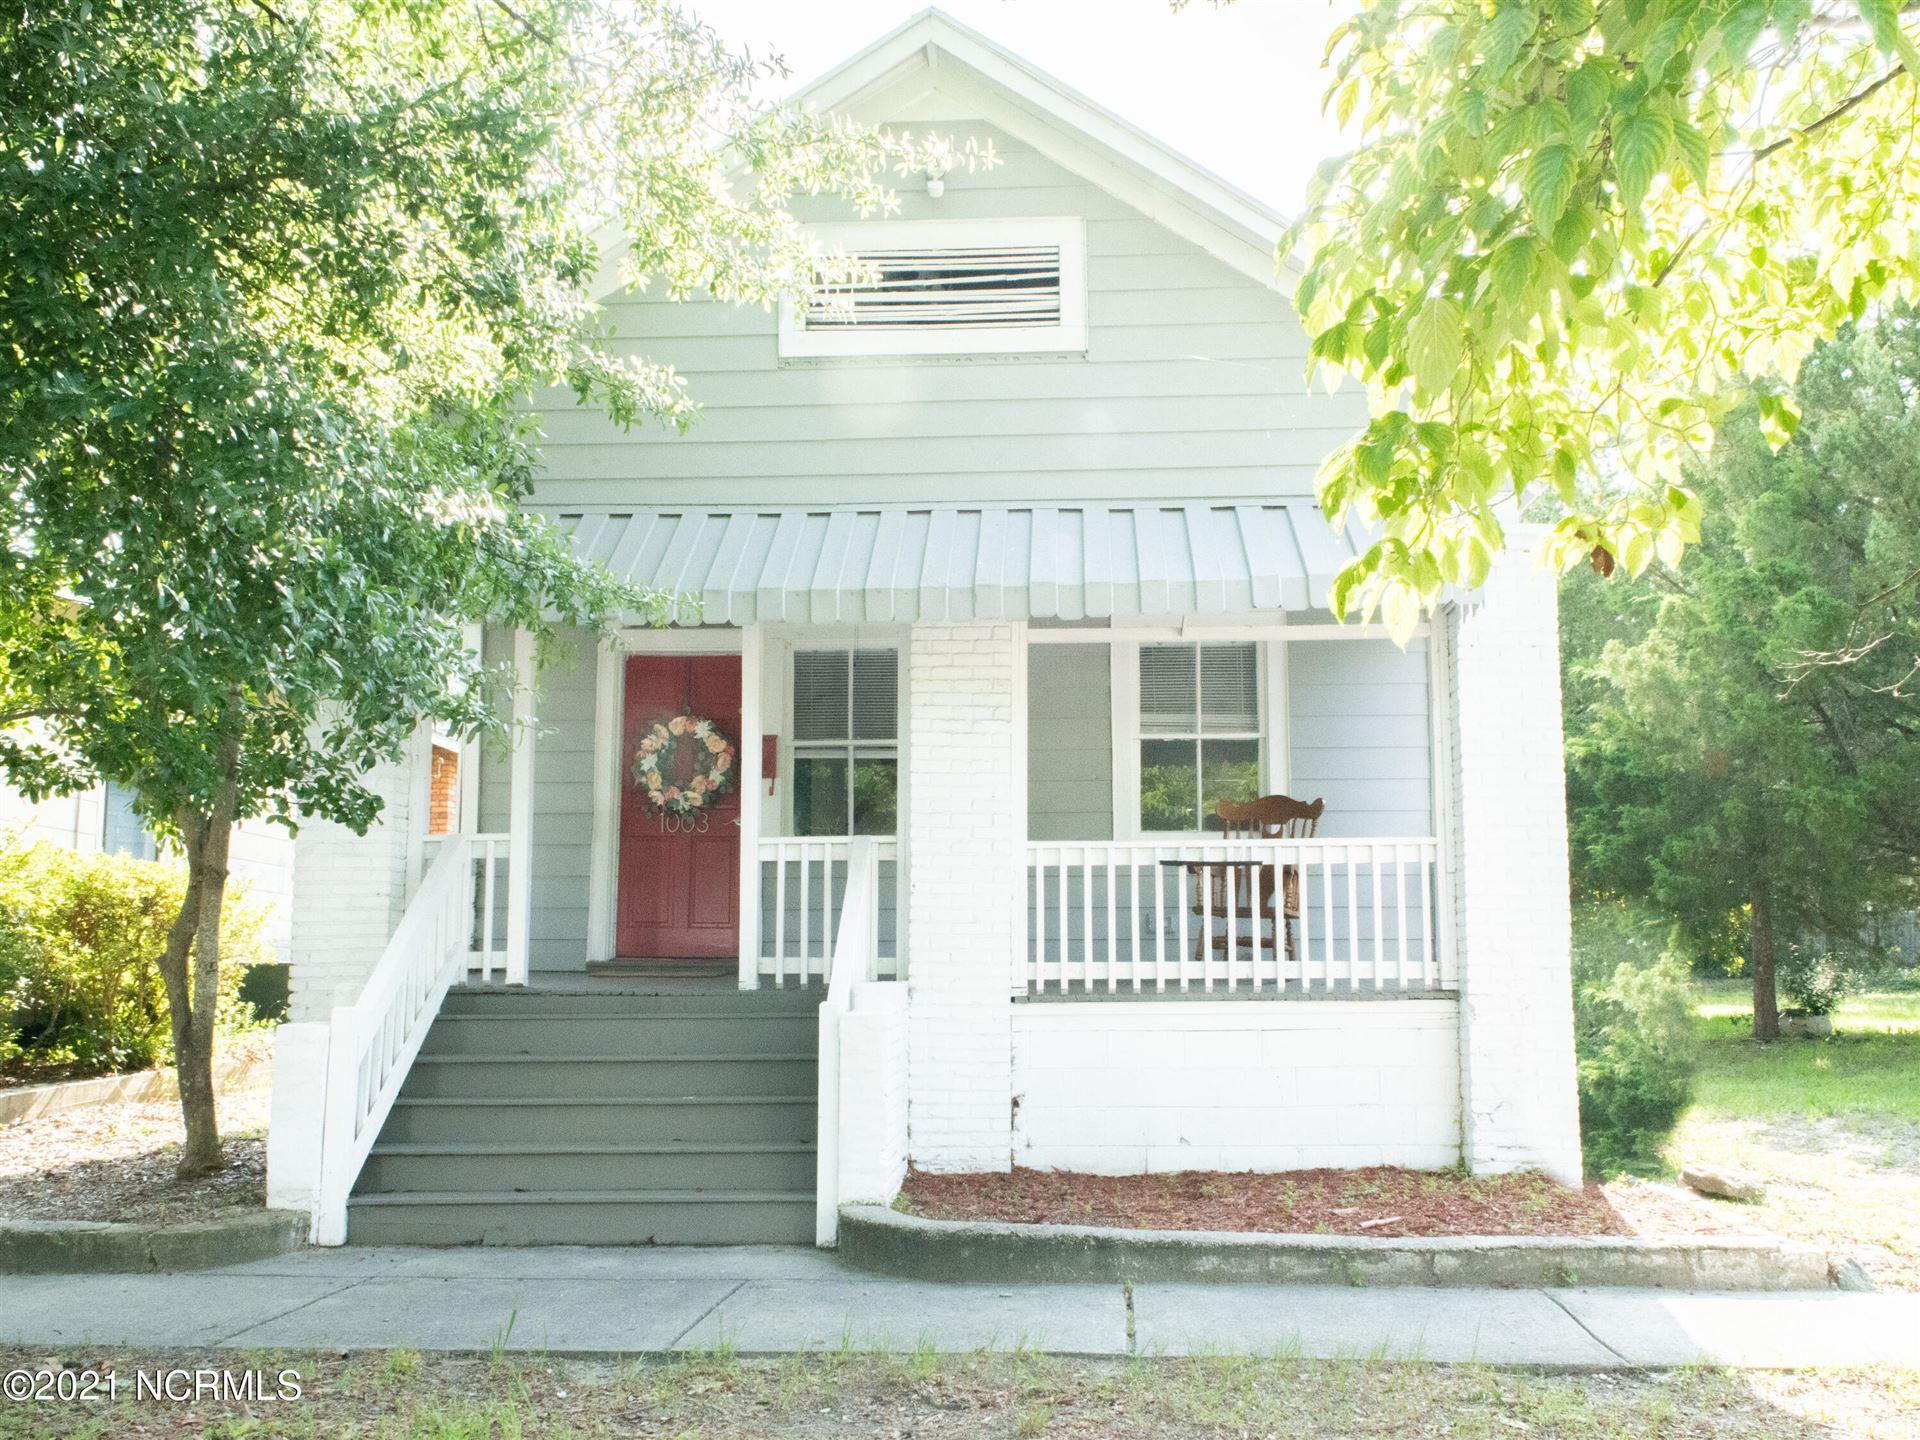 Photo of 1003 S 4th Street, Wilmington, NC 28401 (MLS # 100271820)